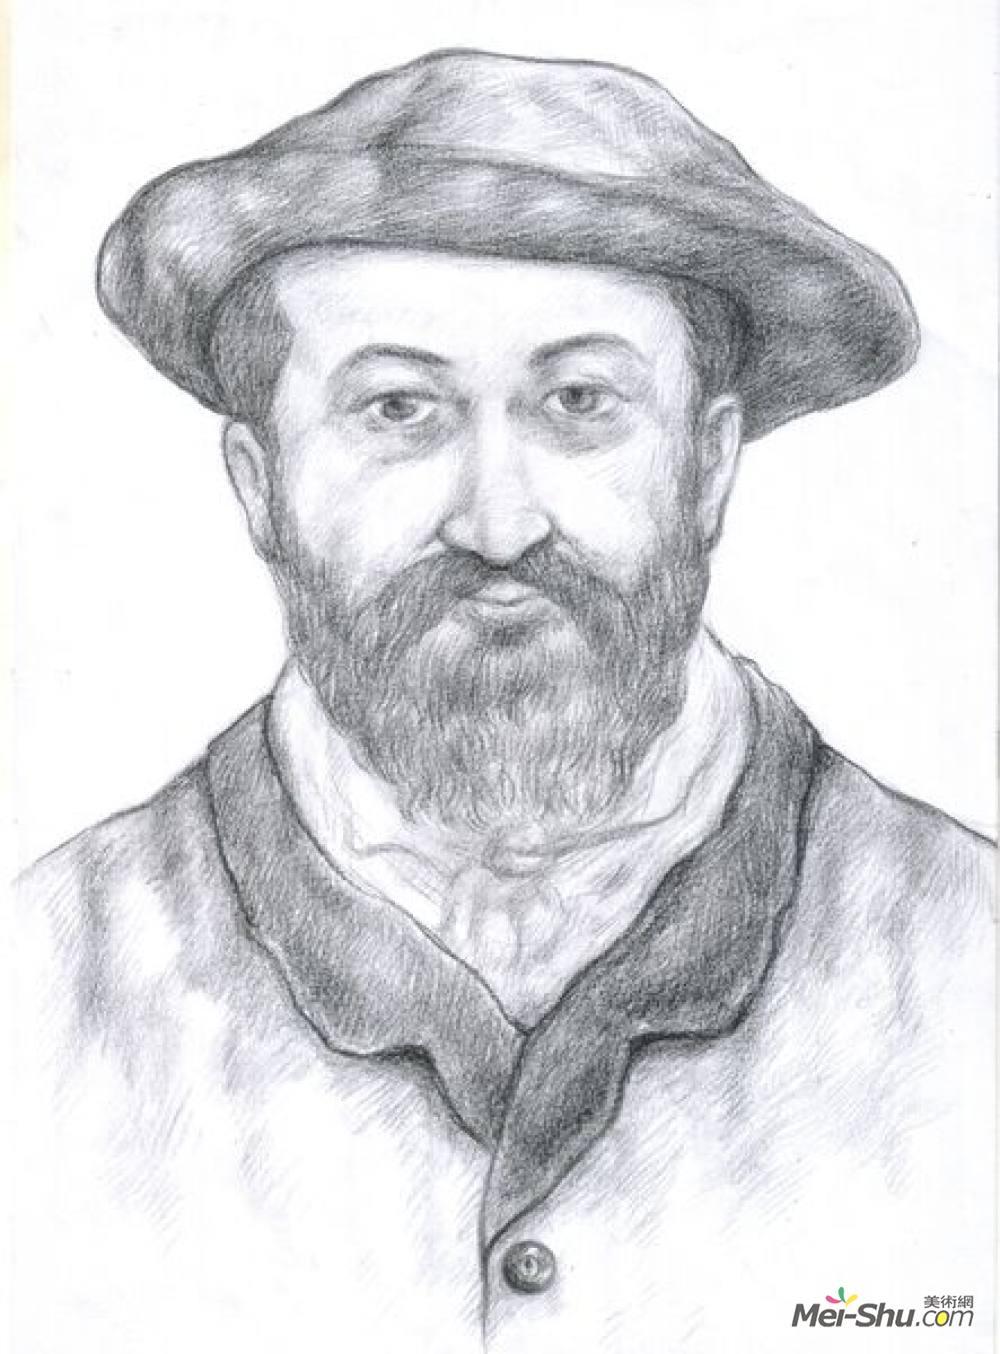 皮埃爾伊曼紐爾達摩耶(Pierre Emmanuel Damoye)